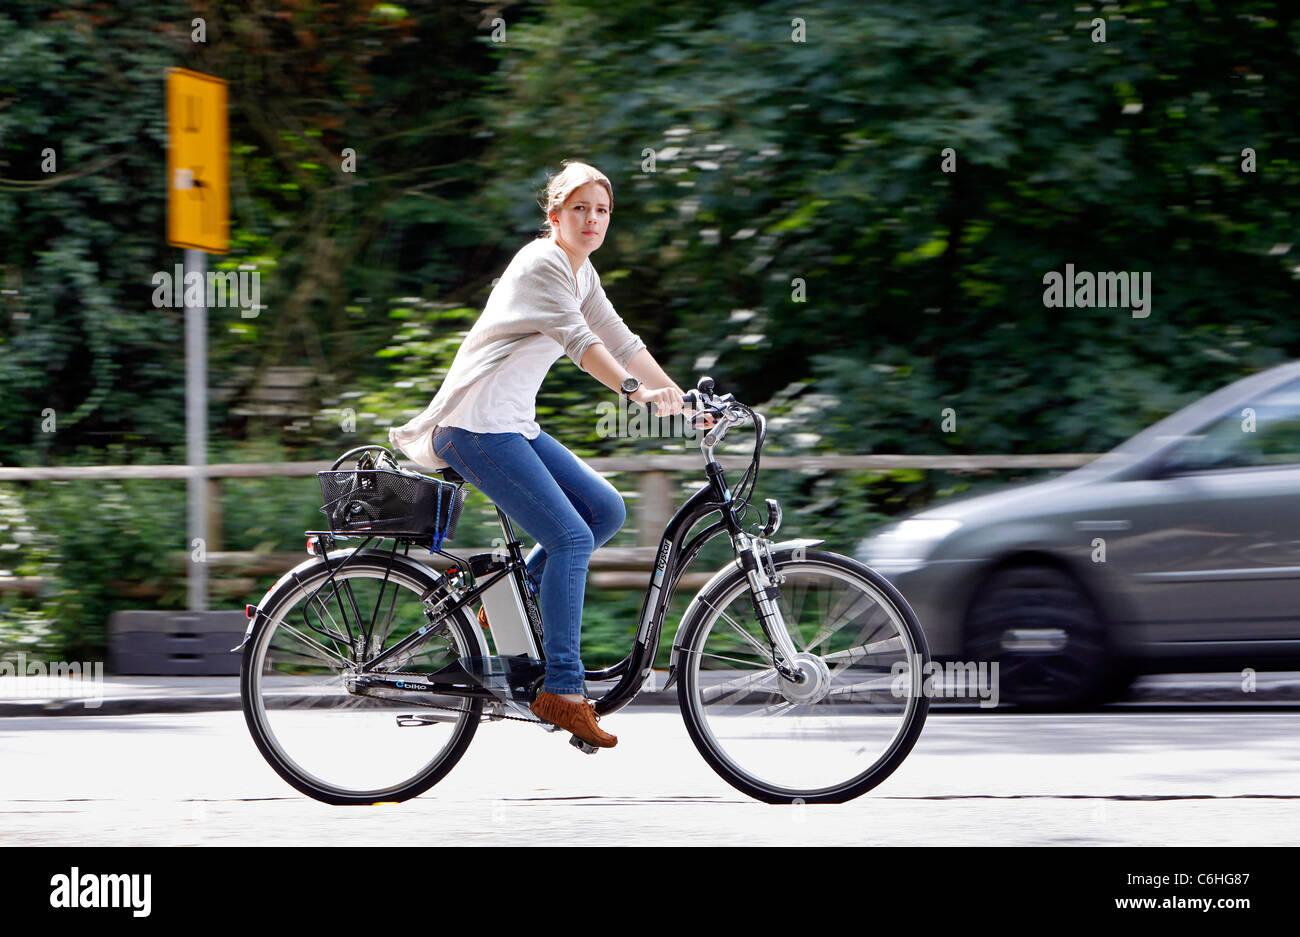 Girl riding on electric bicycle, pedelec, ebike, e-bike, Dortmund, Germany Stock Photo